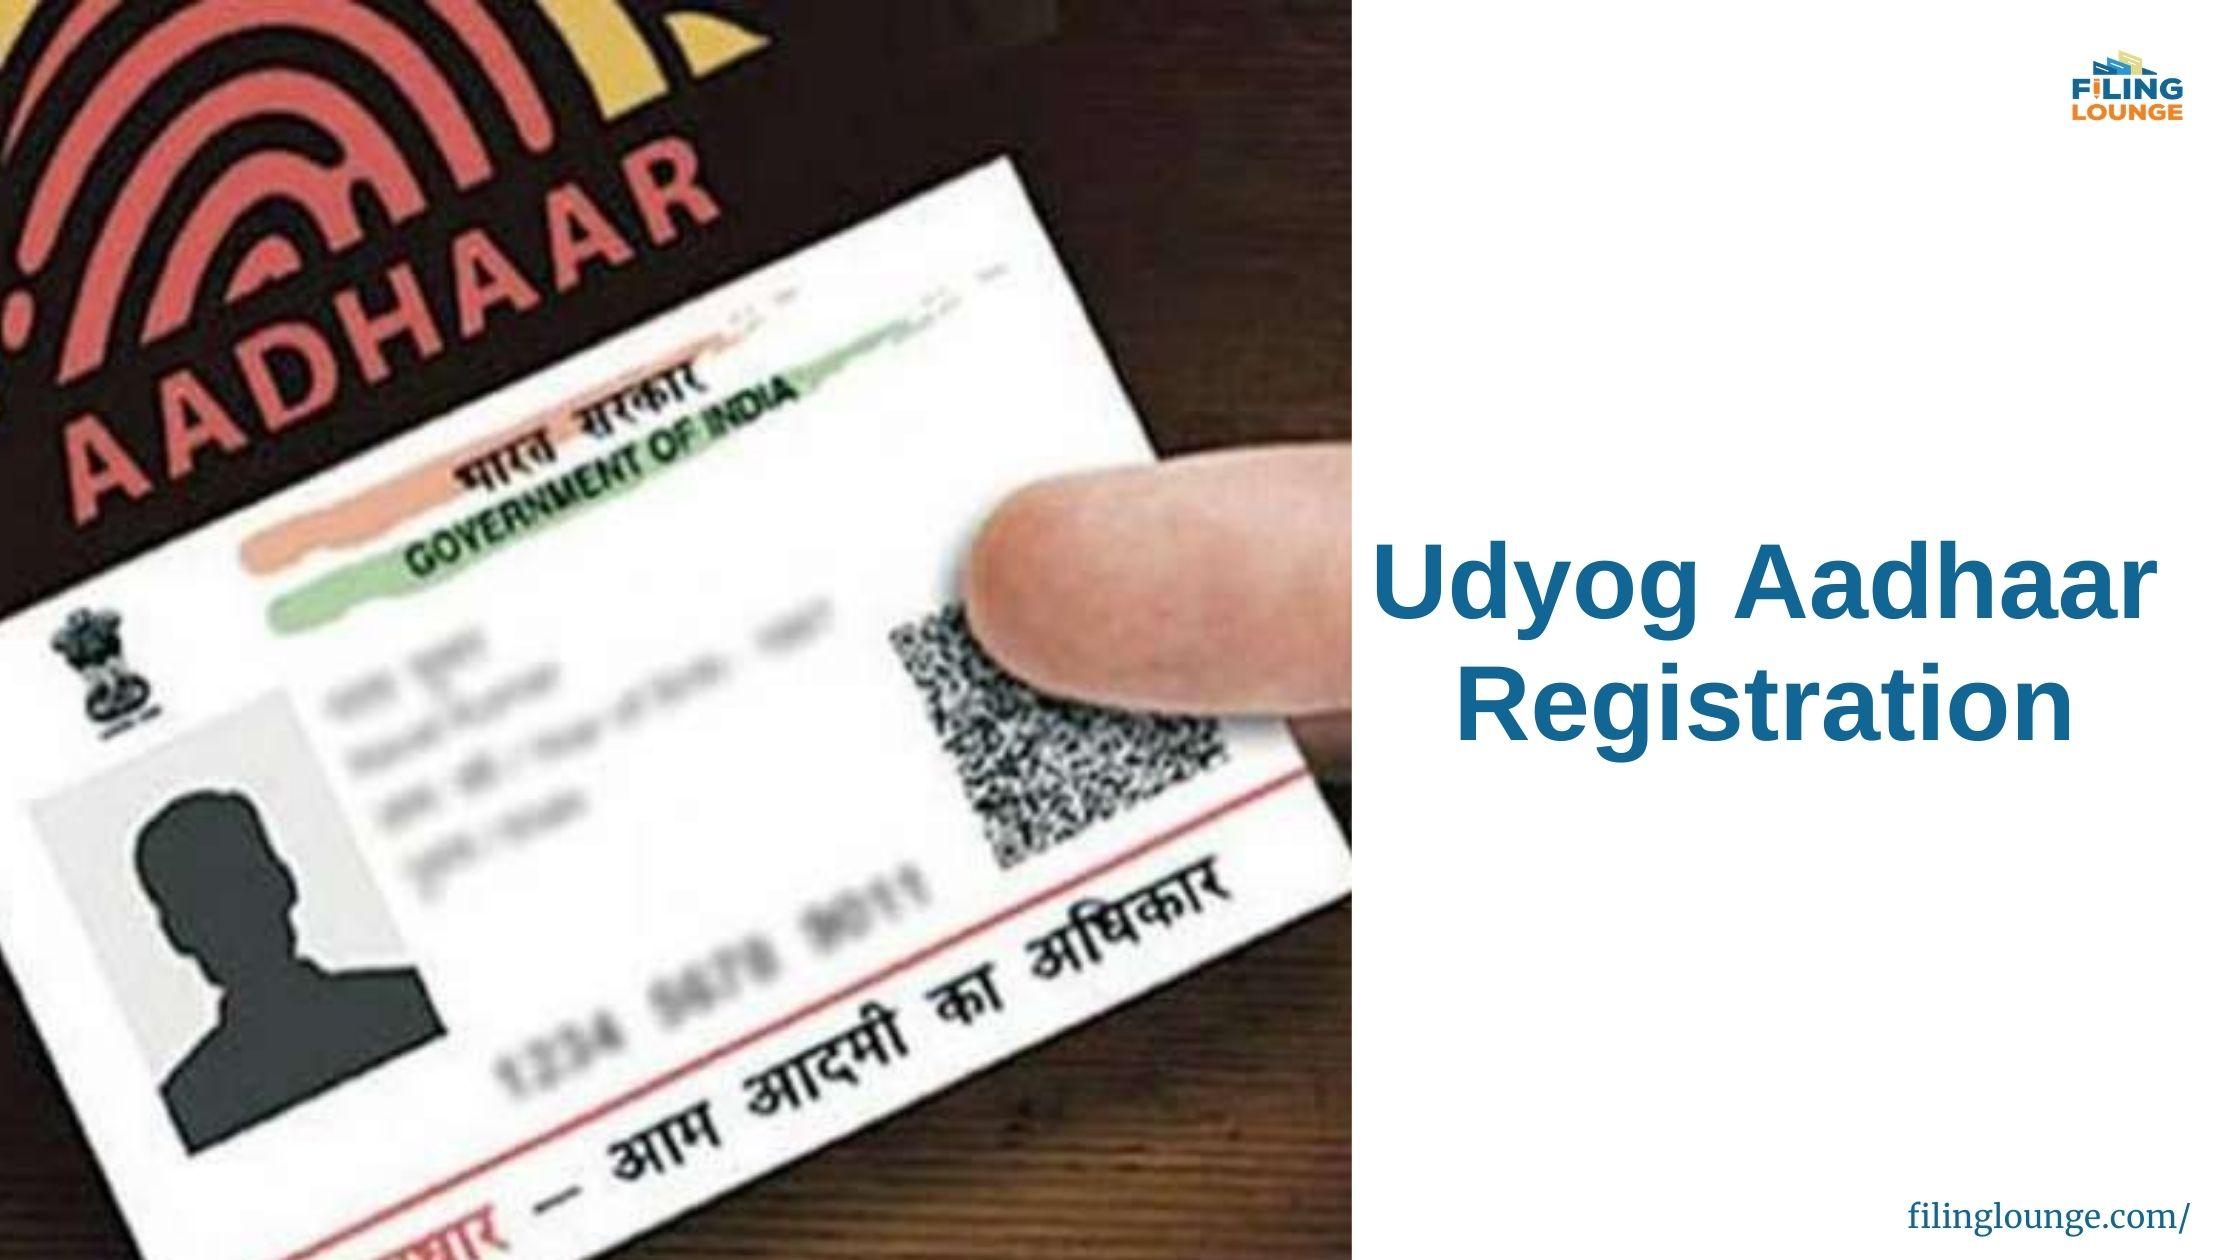 Udyog Aadhar Registration Certificate